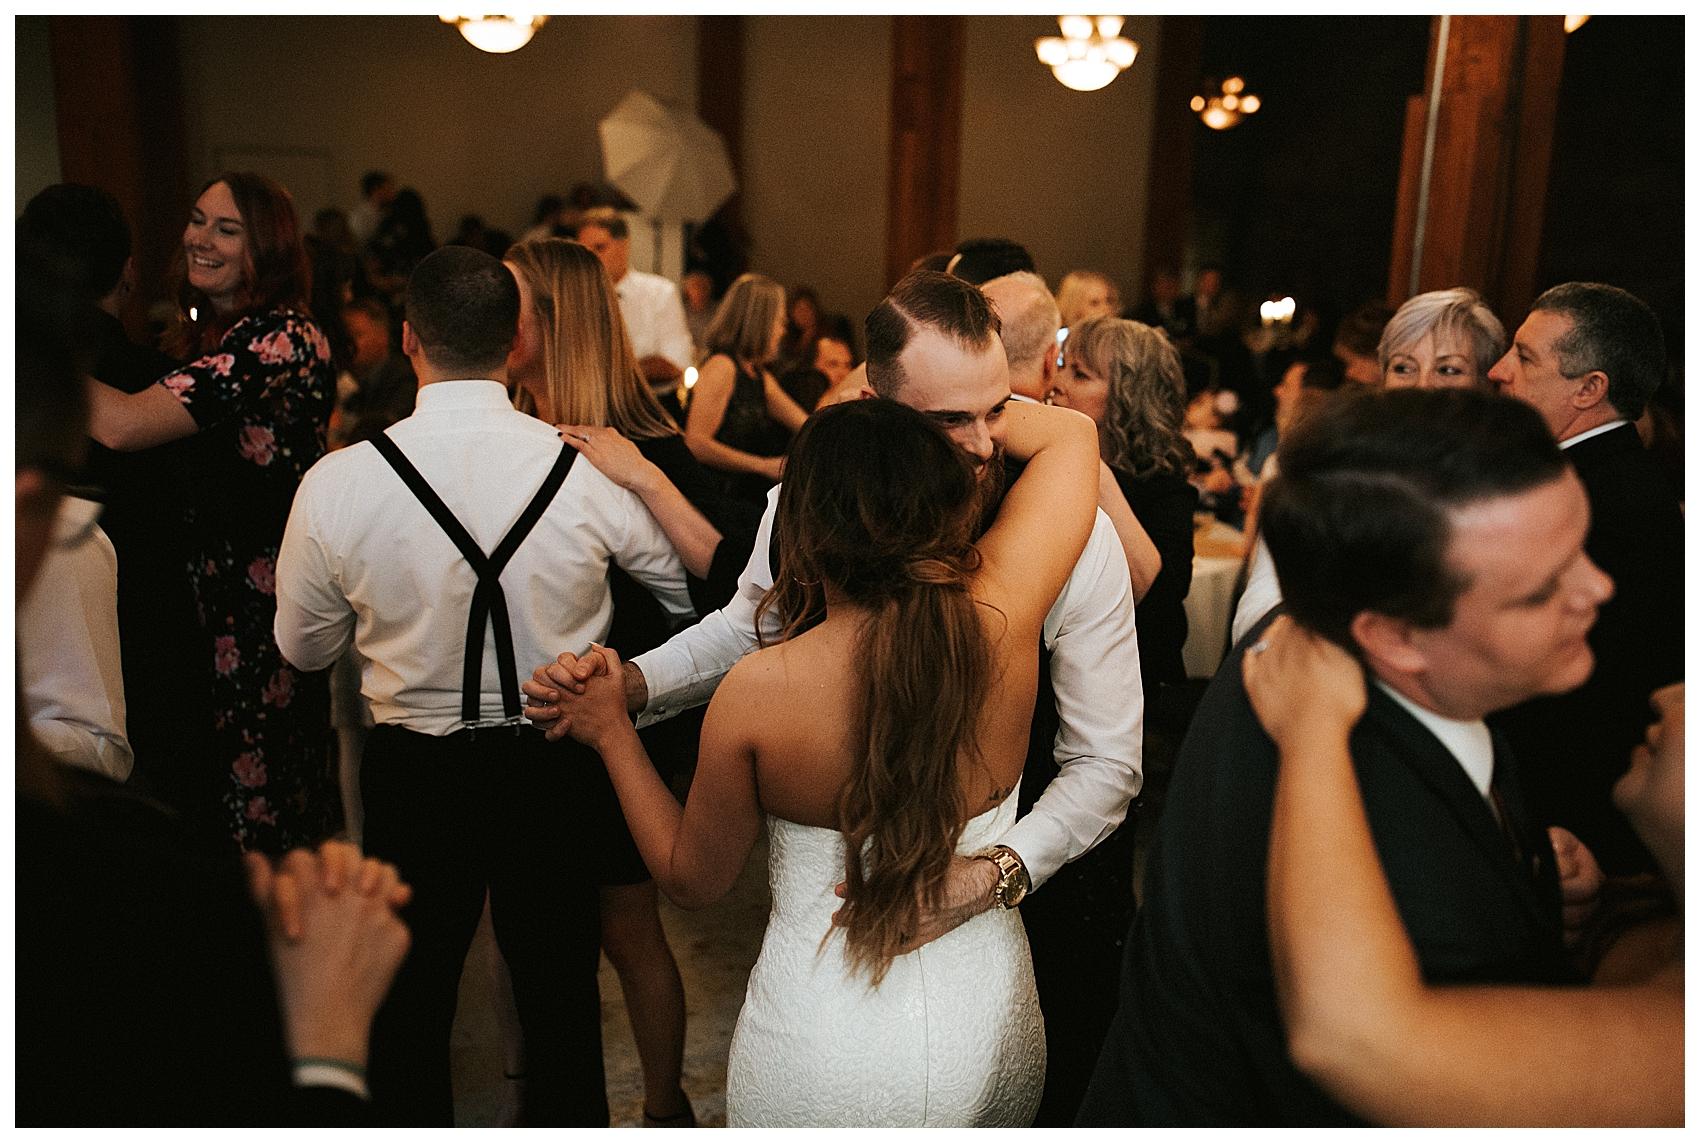 Chateau Rive Spokane Wedding Cassie Trottier Photography01118.jpg